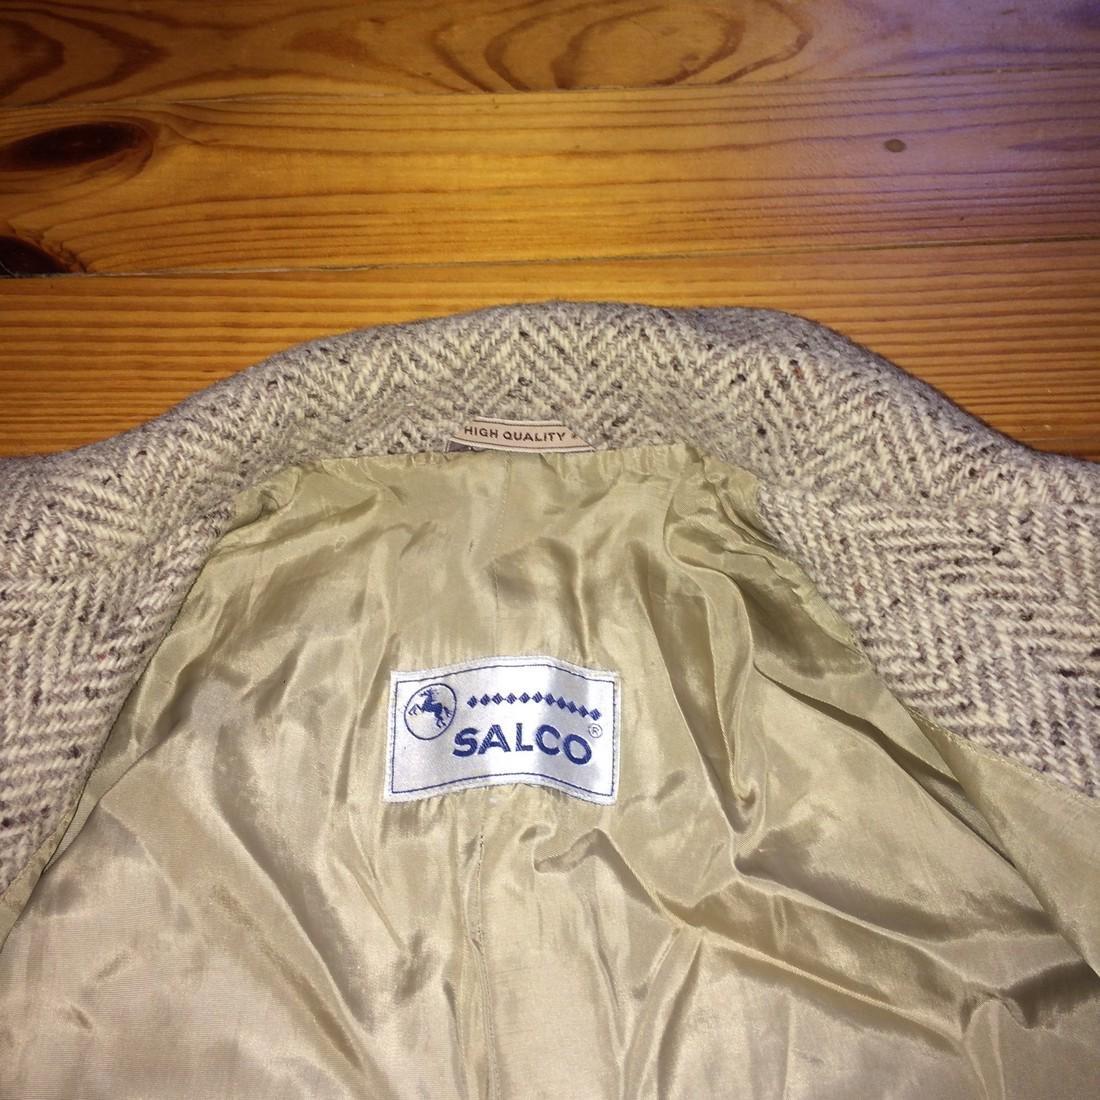 Women's Salco Pure New Wool Jacket Coat Size XL - 10